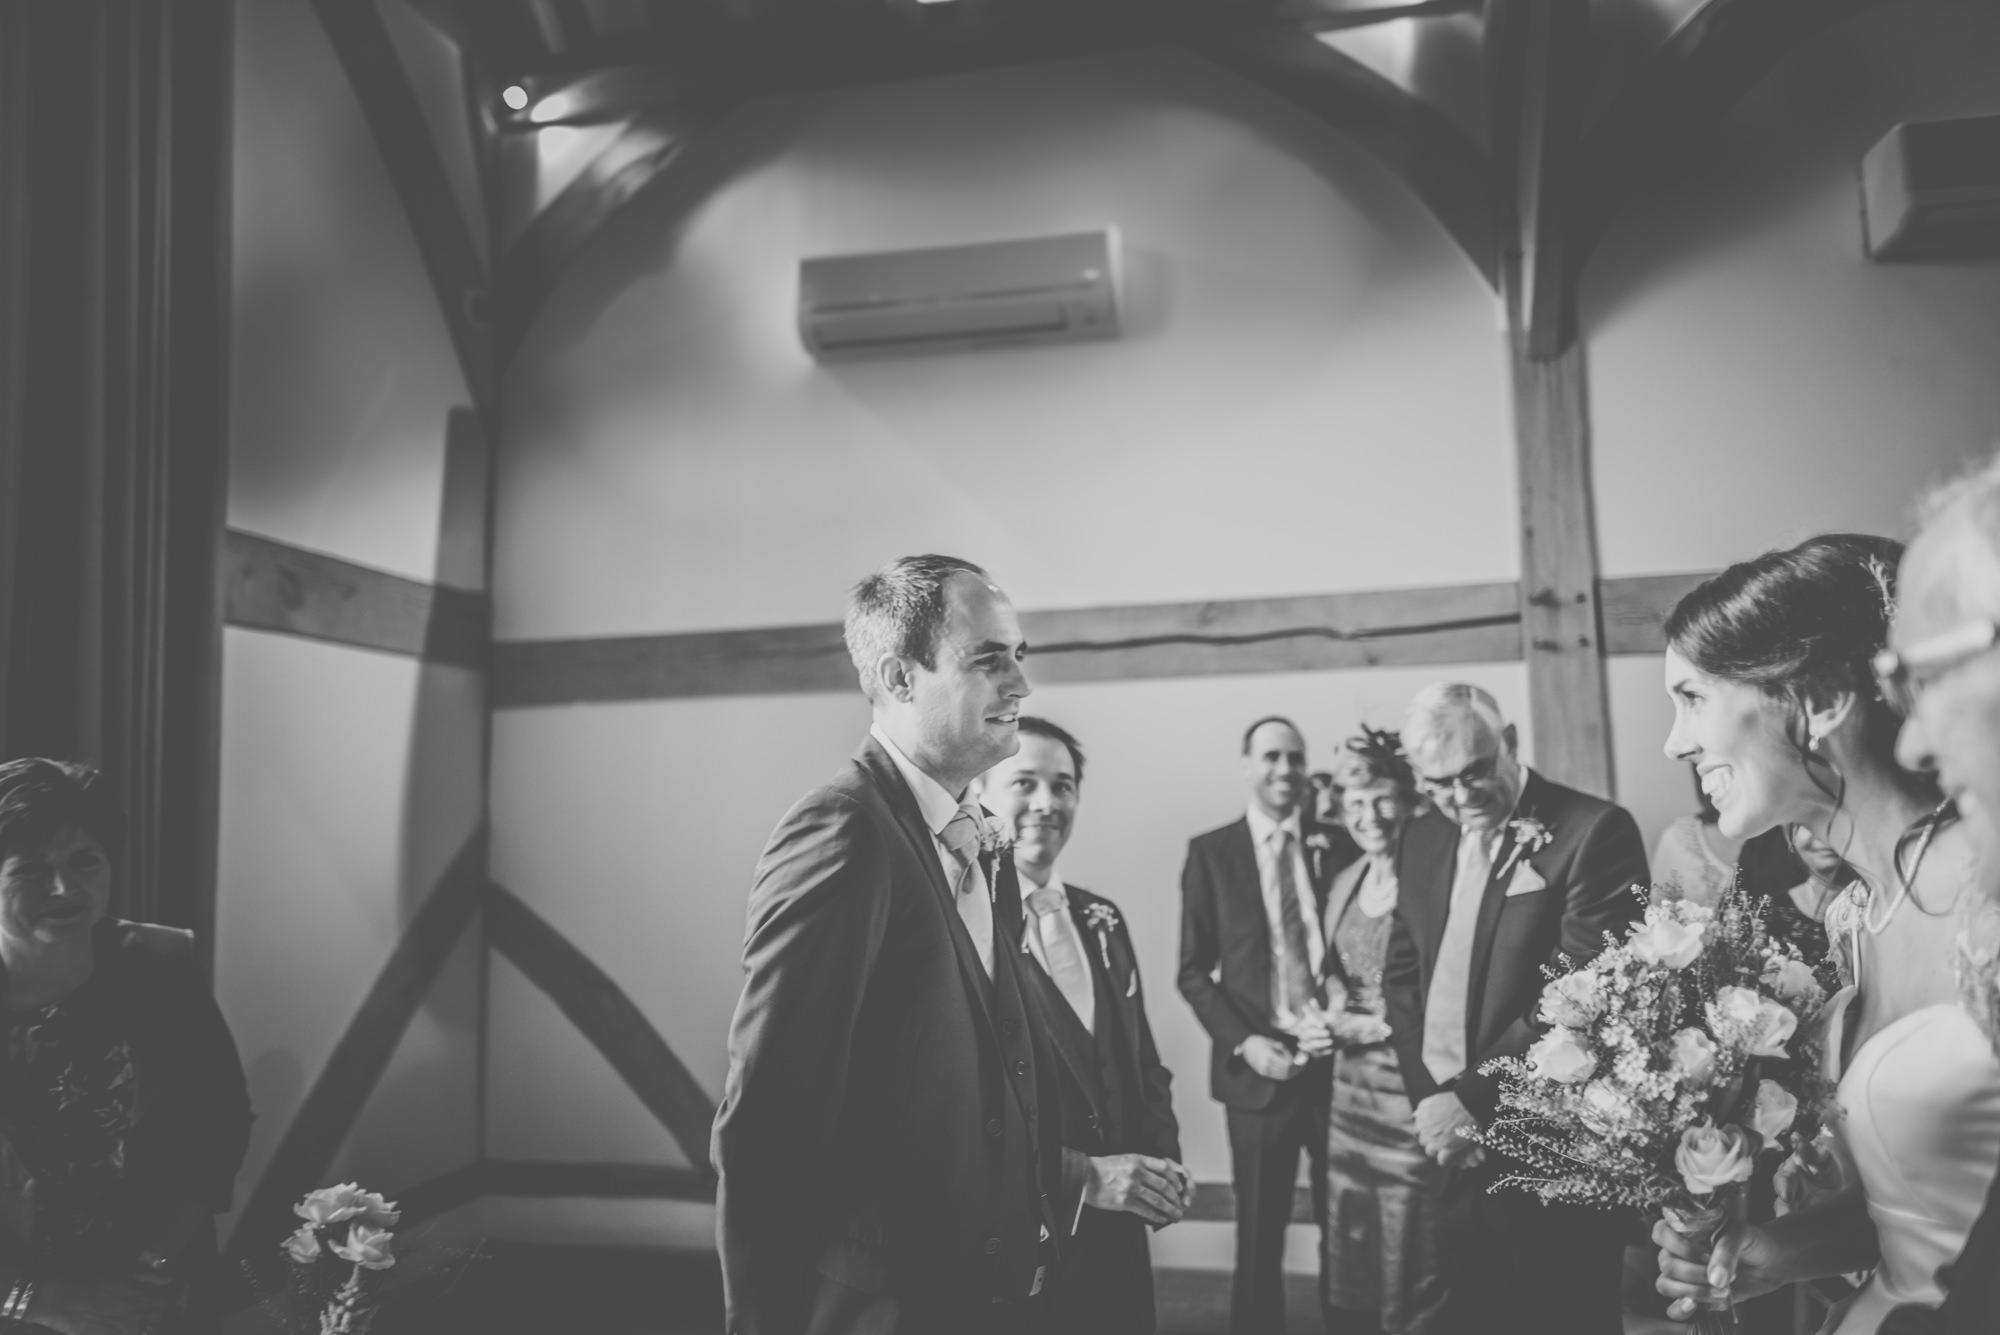 Charisse-and-James-wedding-in-Cain-Manor-Venue-Hampshire-Manu-Mendoza-Wedding-Photography-209.jpg